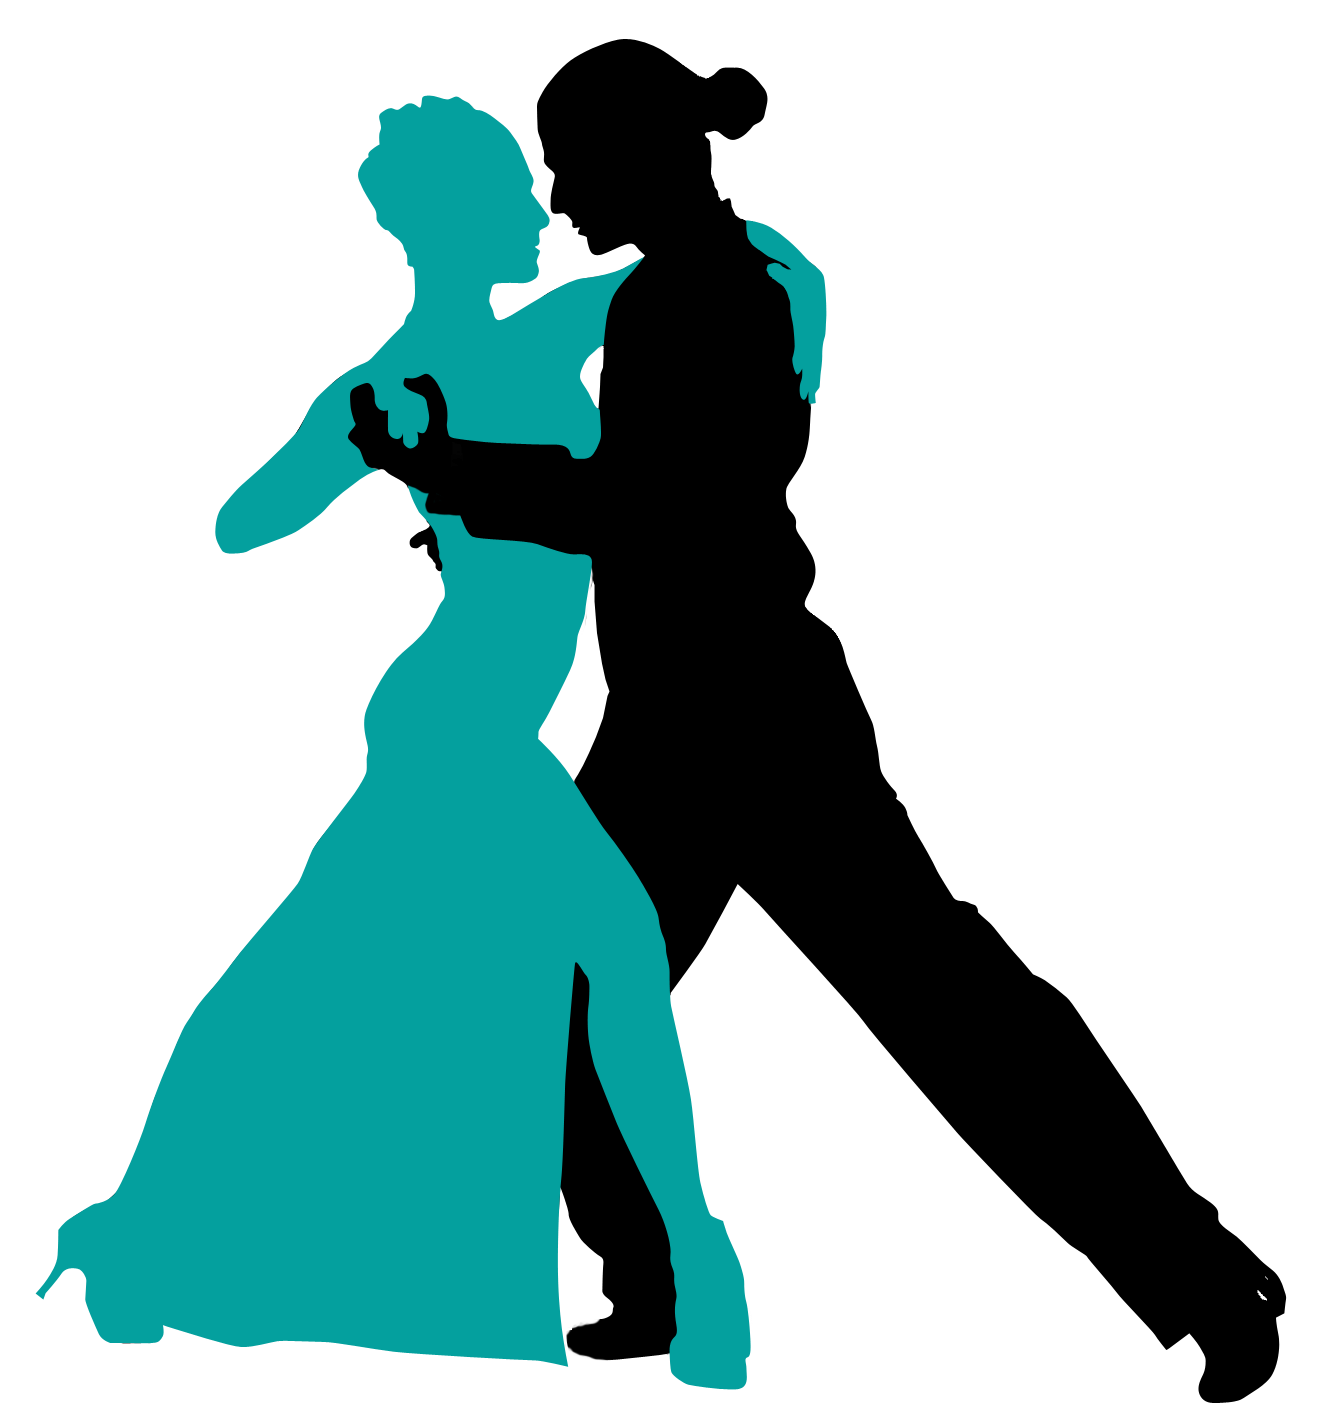 Tango dancer silhouette at. Dance clipart social dance